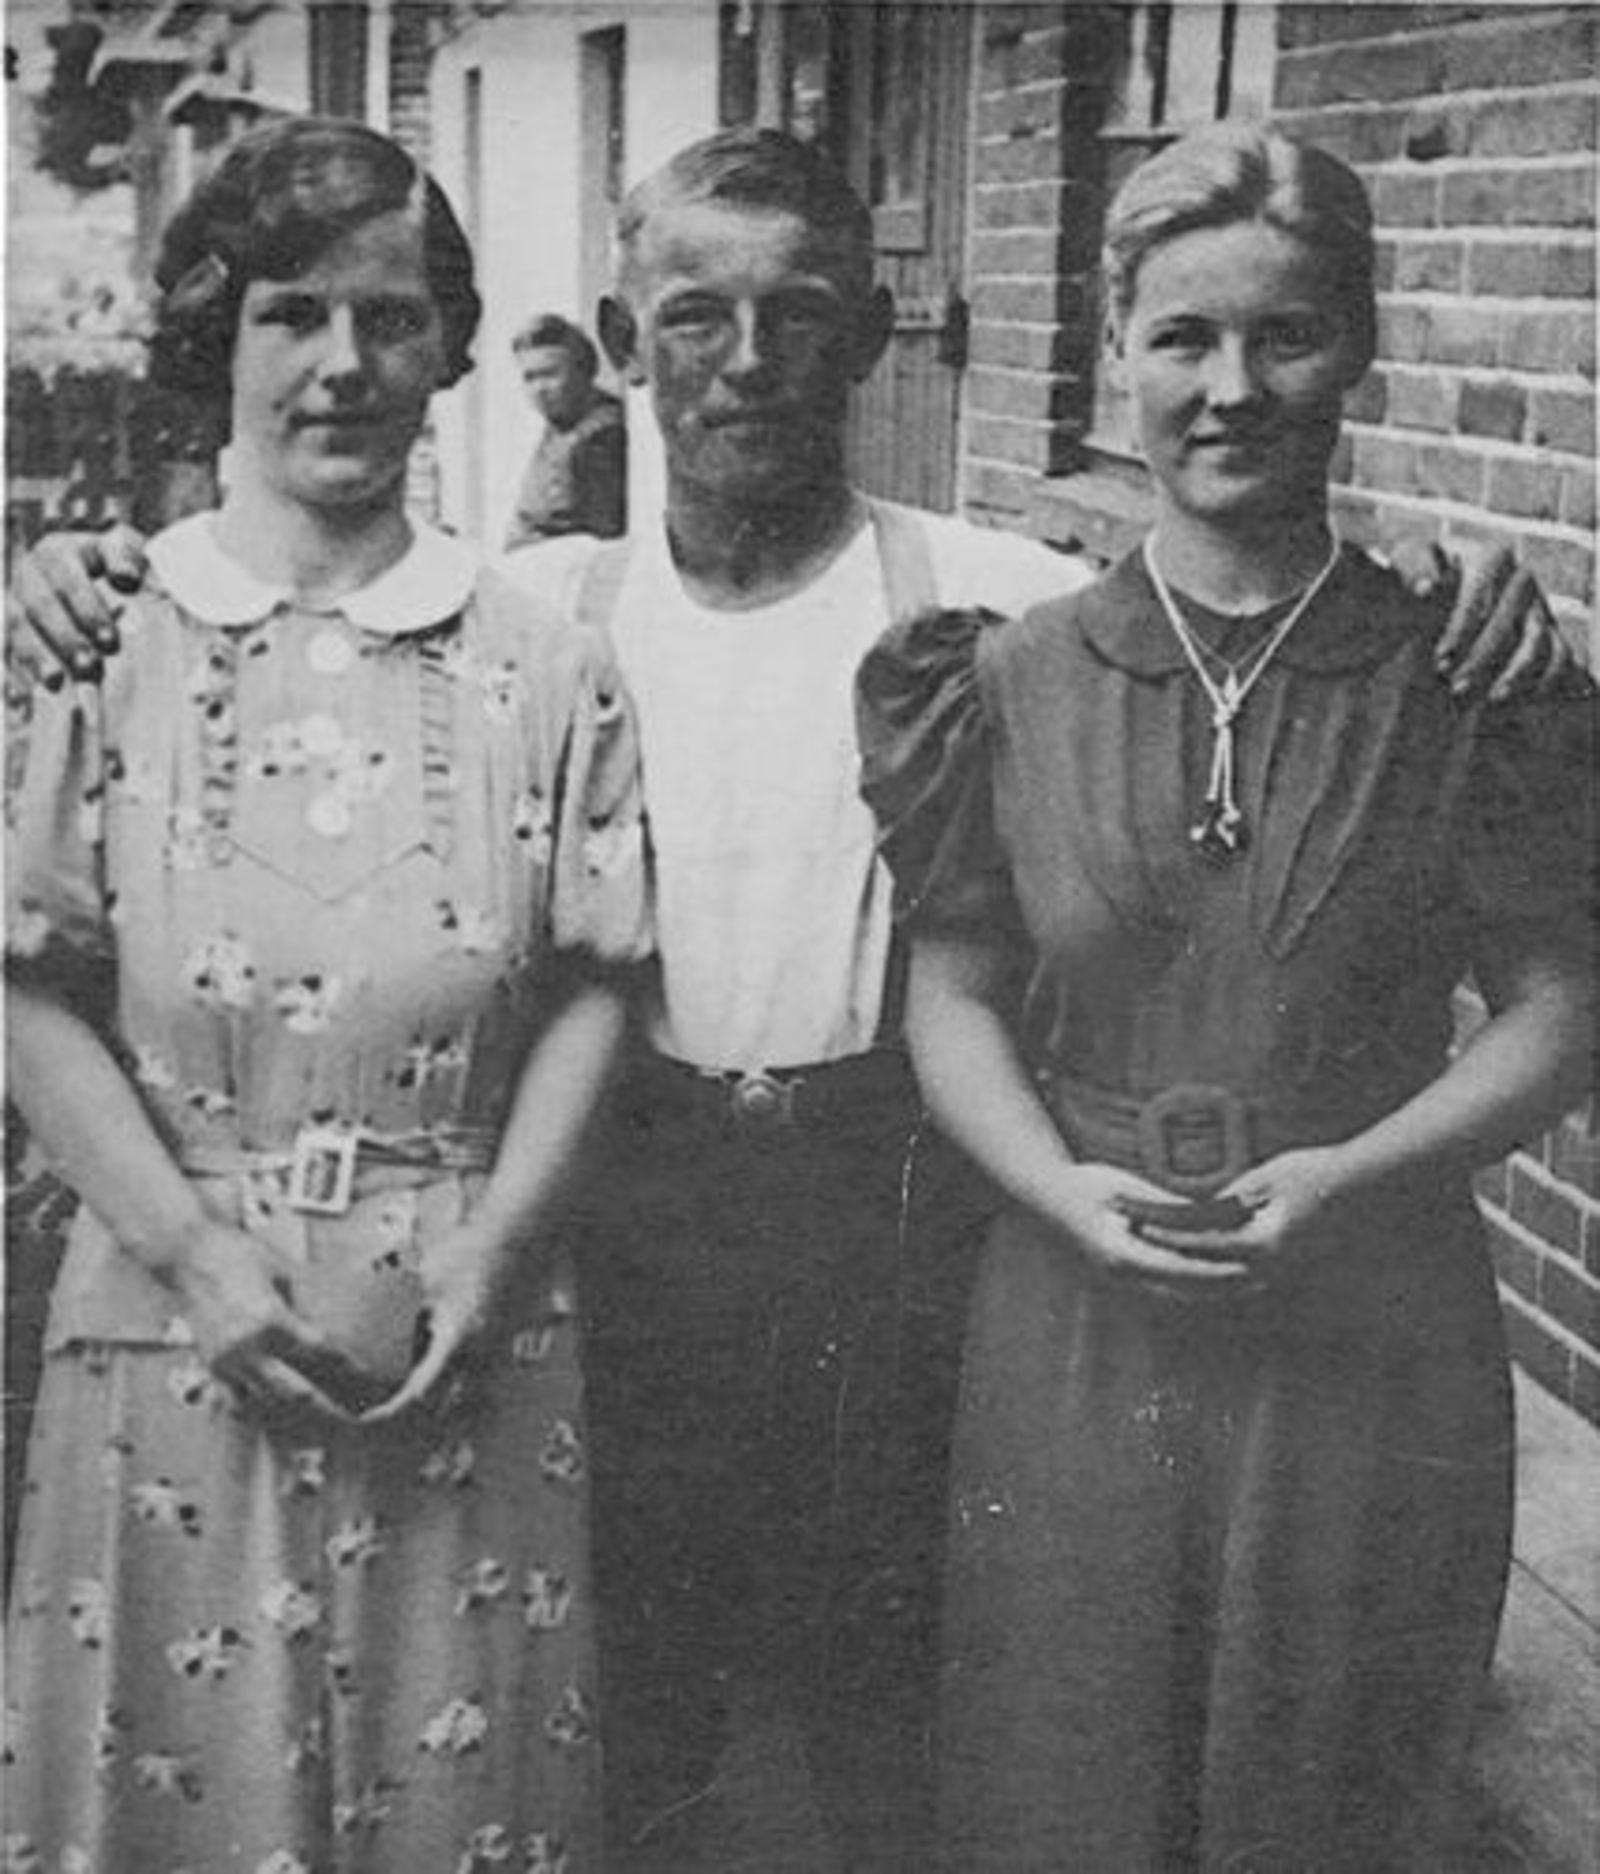 Bliek Gerrit 1917 1937 met zusters Koosje en Leentje